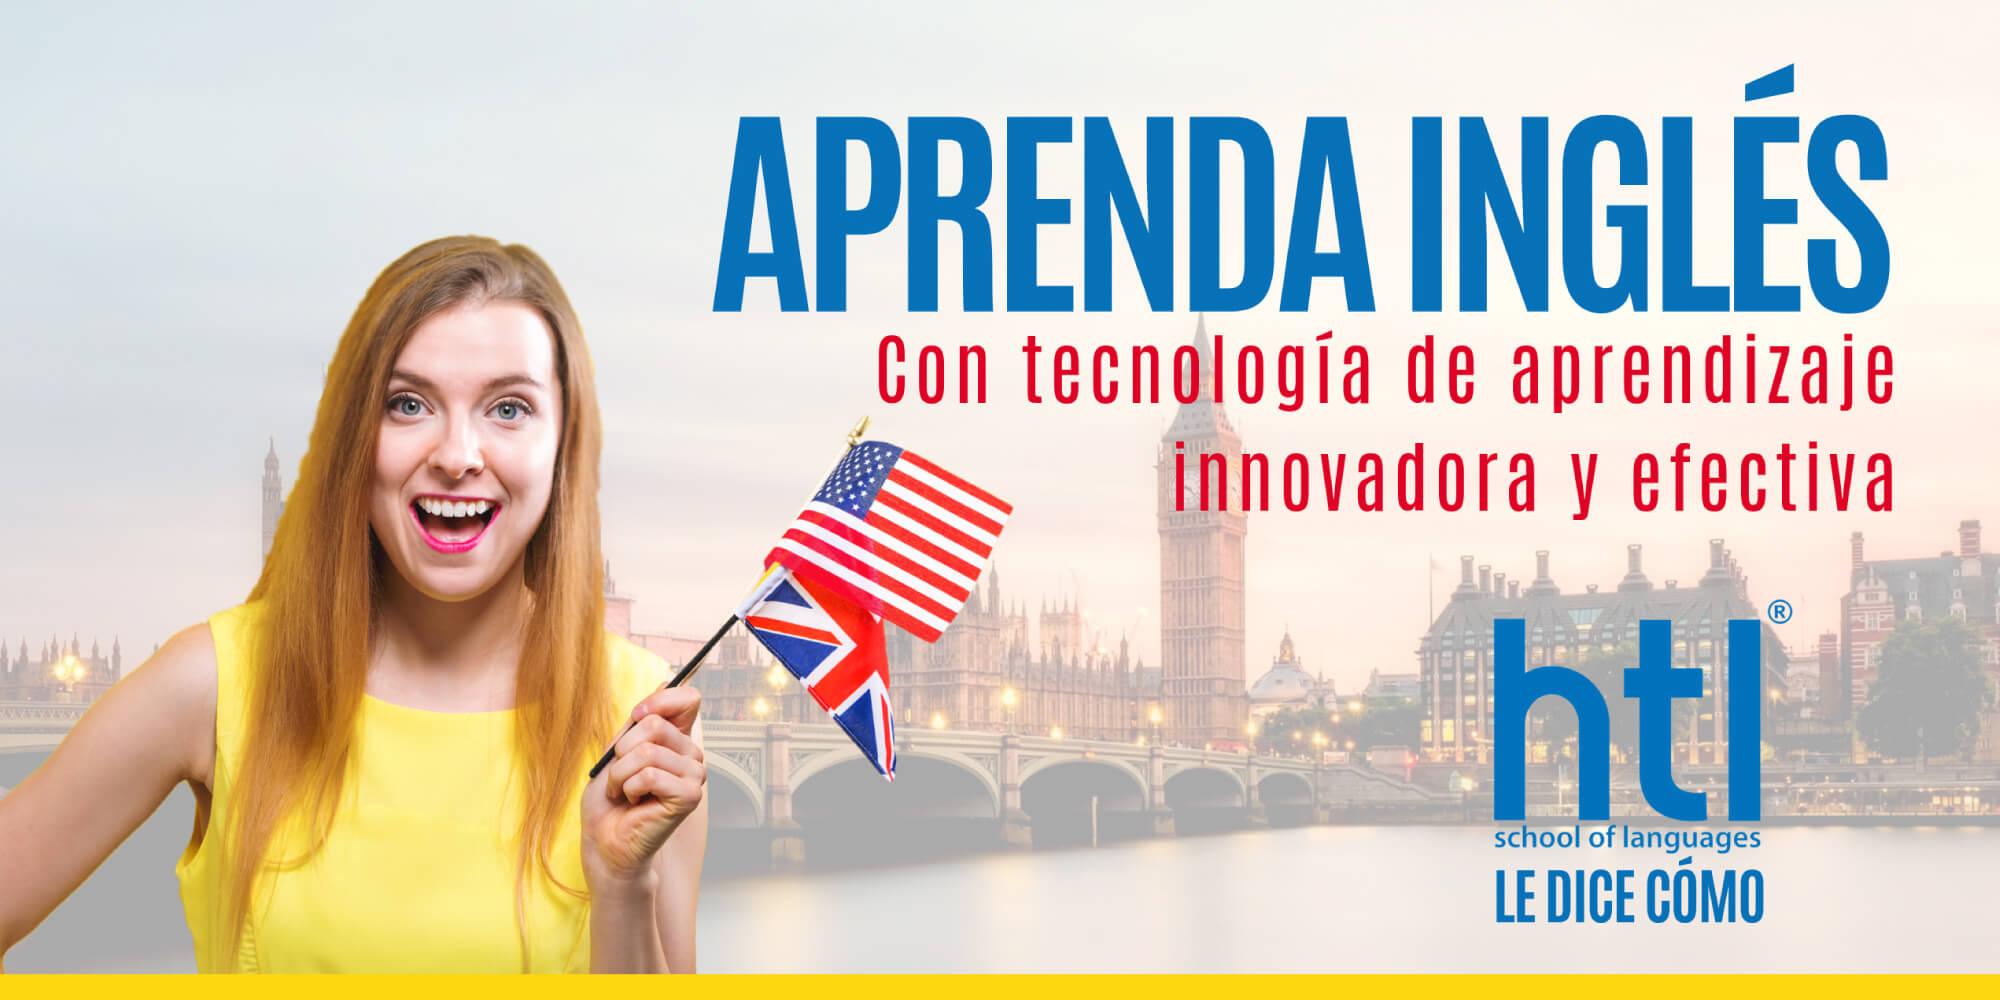 Cursos ingles, Curso ingles en Bogota, Curso de idiomas, Aprender ingles, Aprender ingles Facil, Aprendes ingles R?pido.